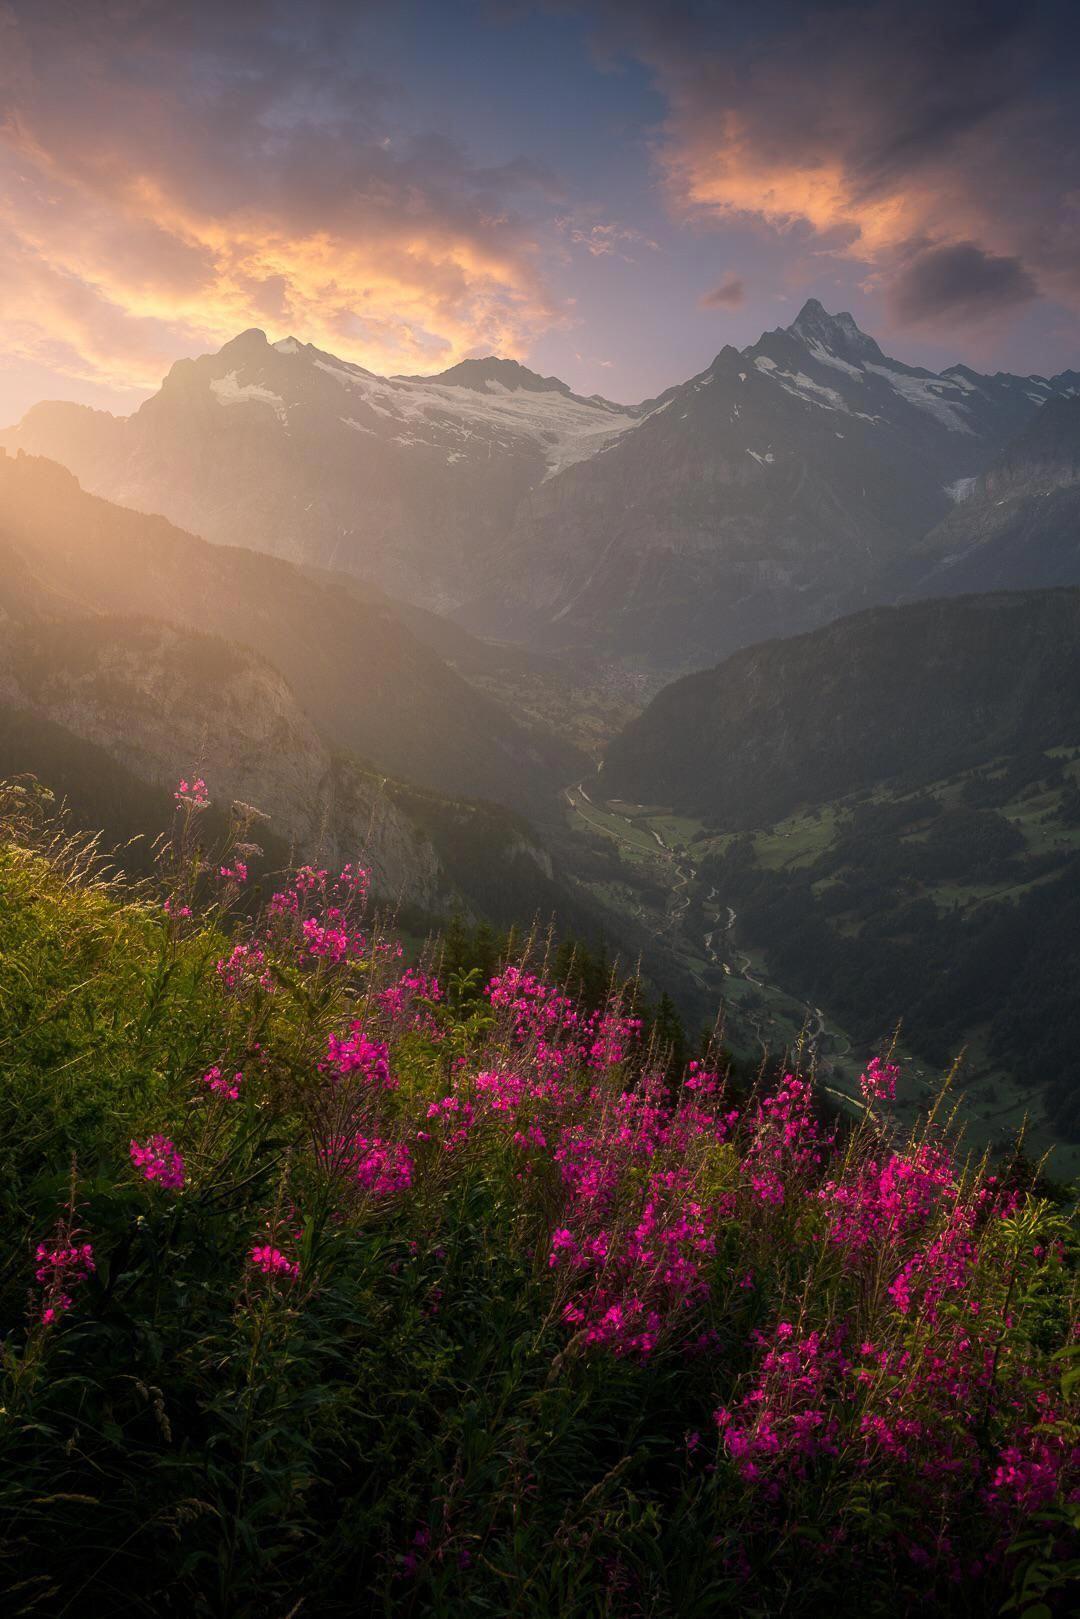 Landscape Photography Colorful Landscapephotographytips Landscape Photography Landscape Nature Photography